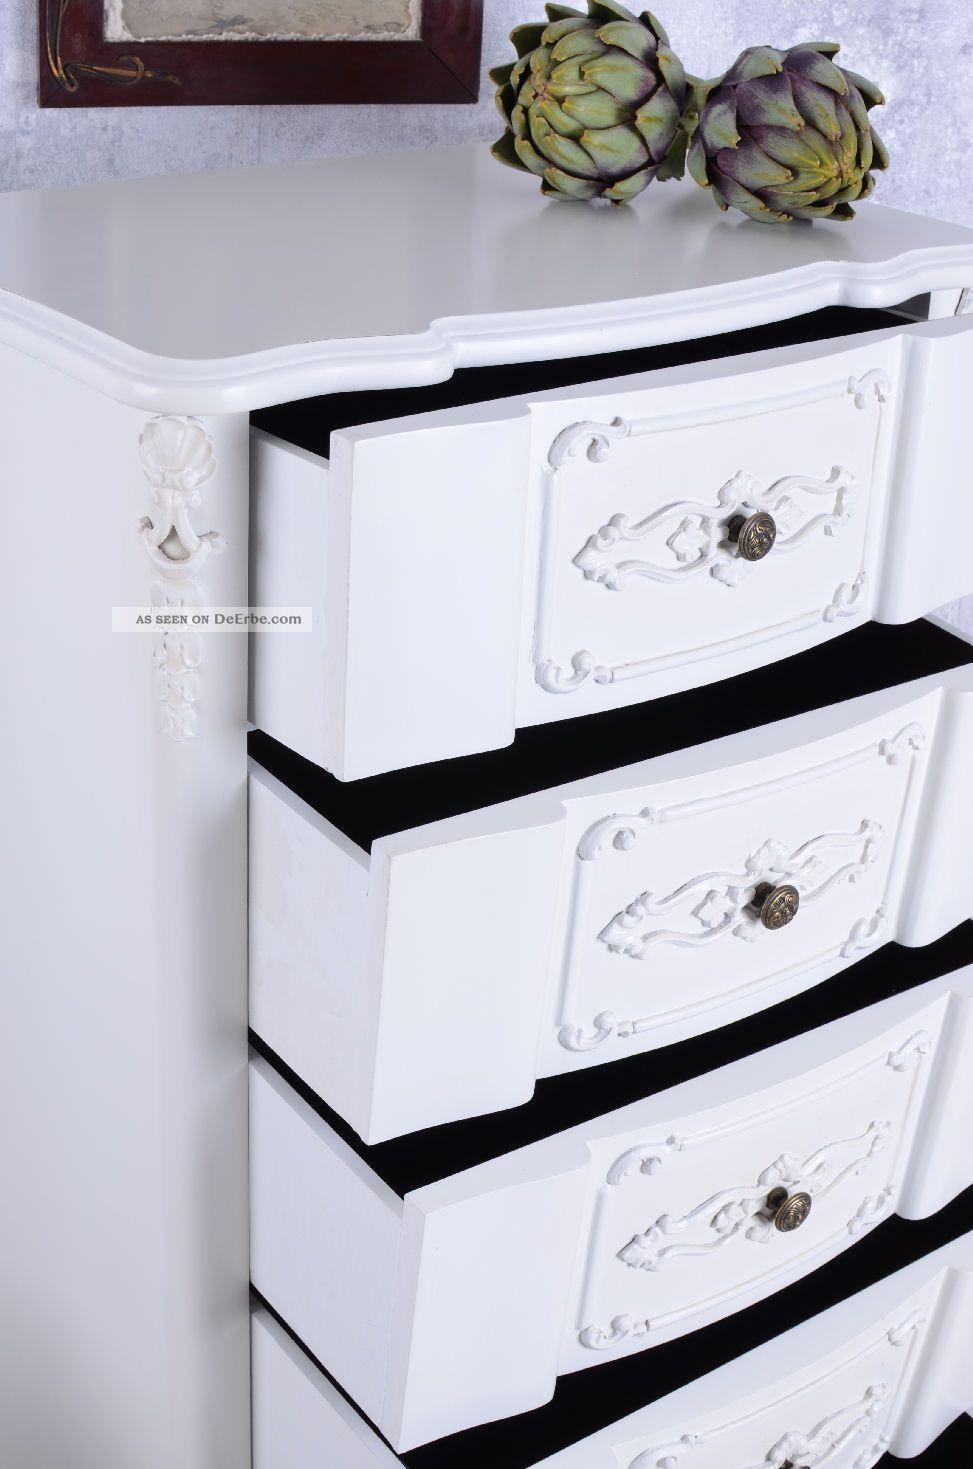 kommode weiss hochkommode shabby chic 6 schubladen vintage. Black Bedroom Furniture Sets. Home Design Ideas